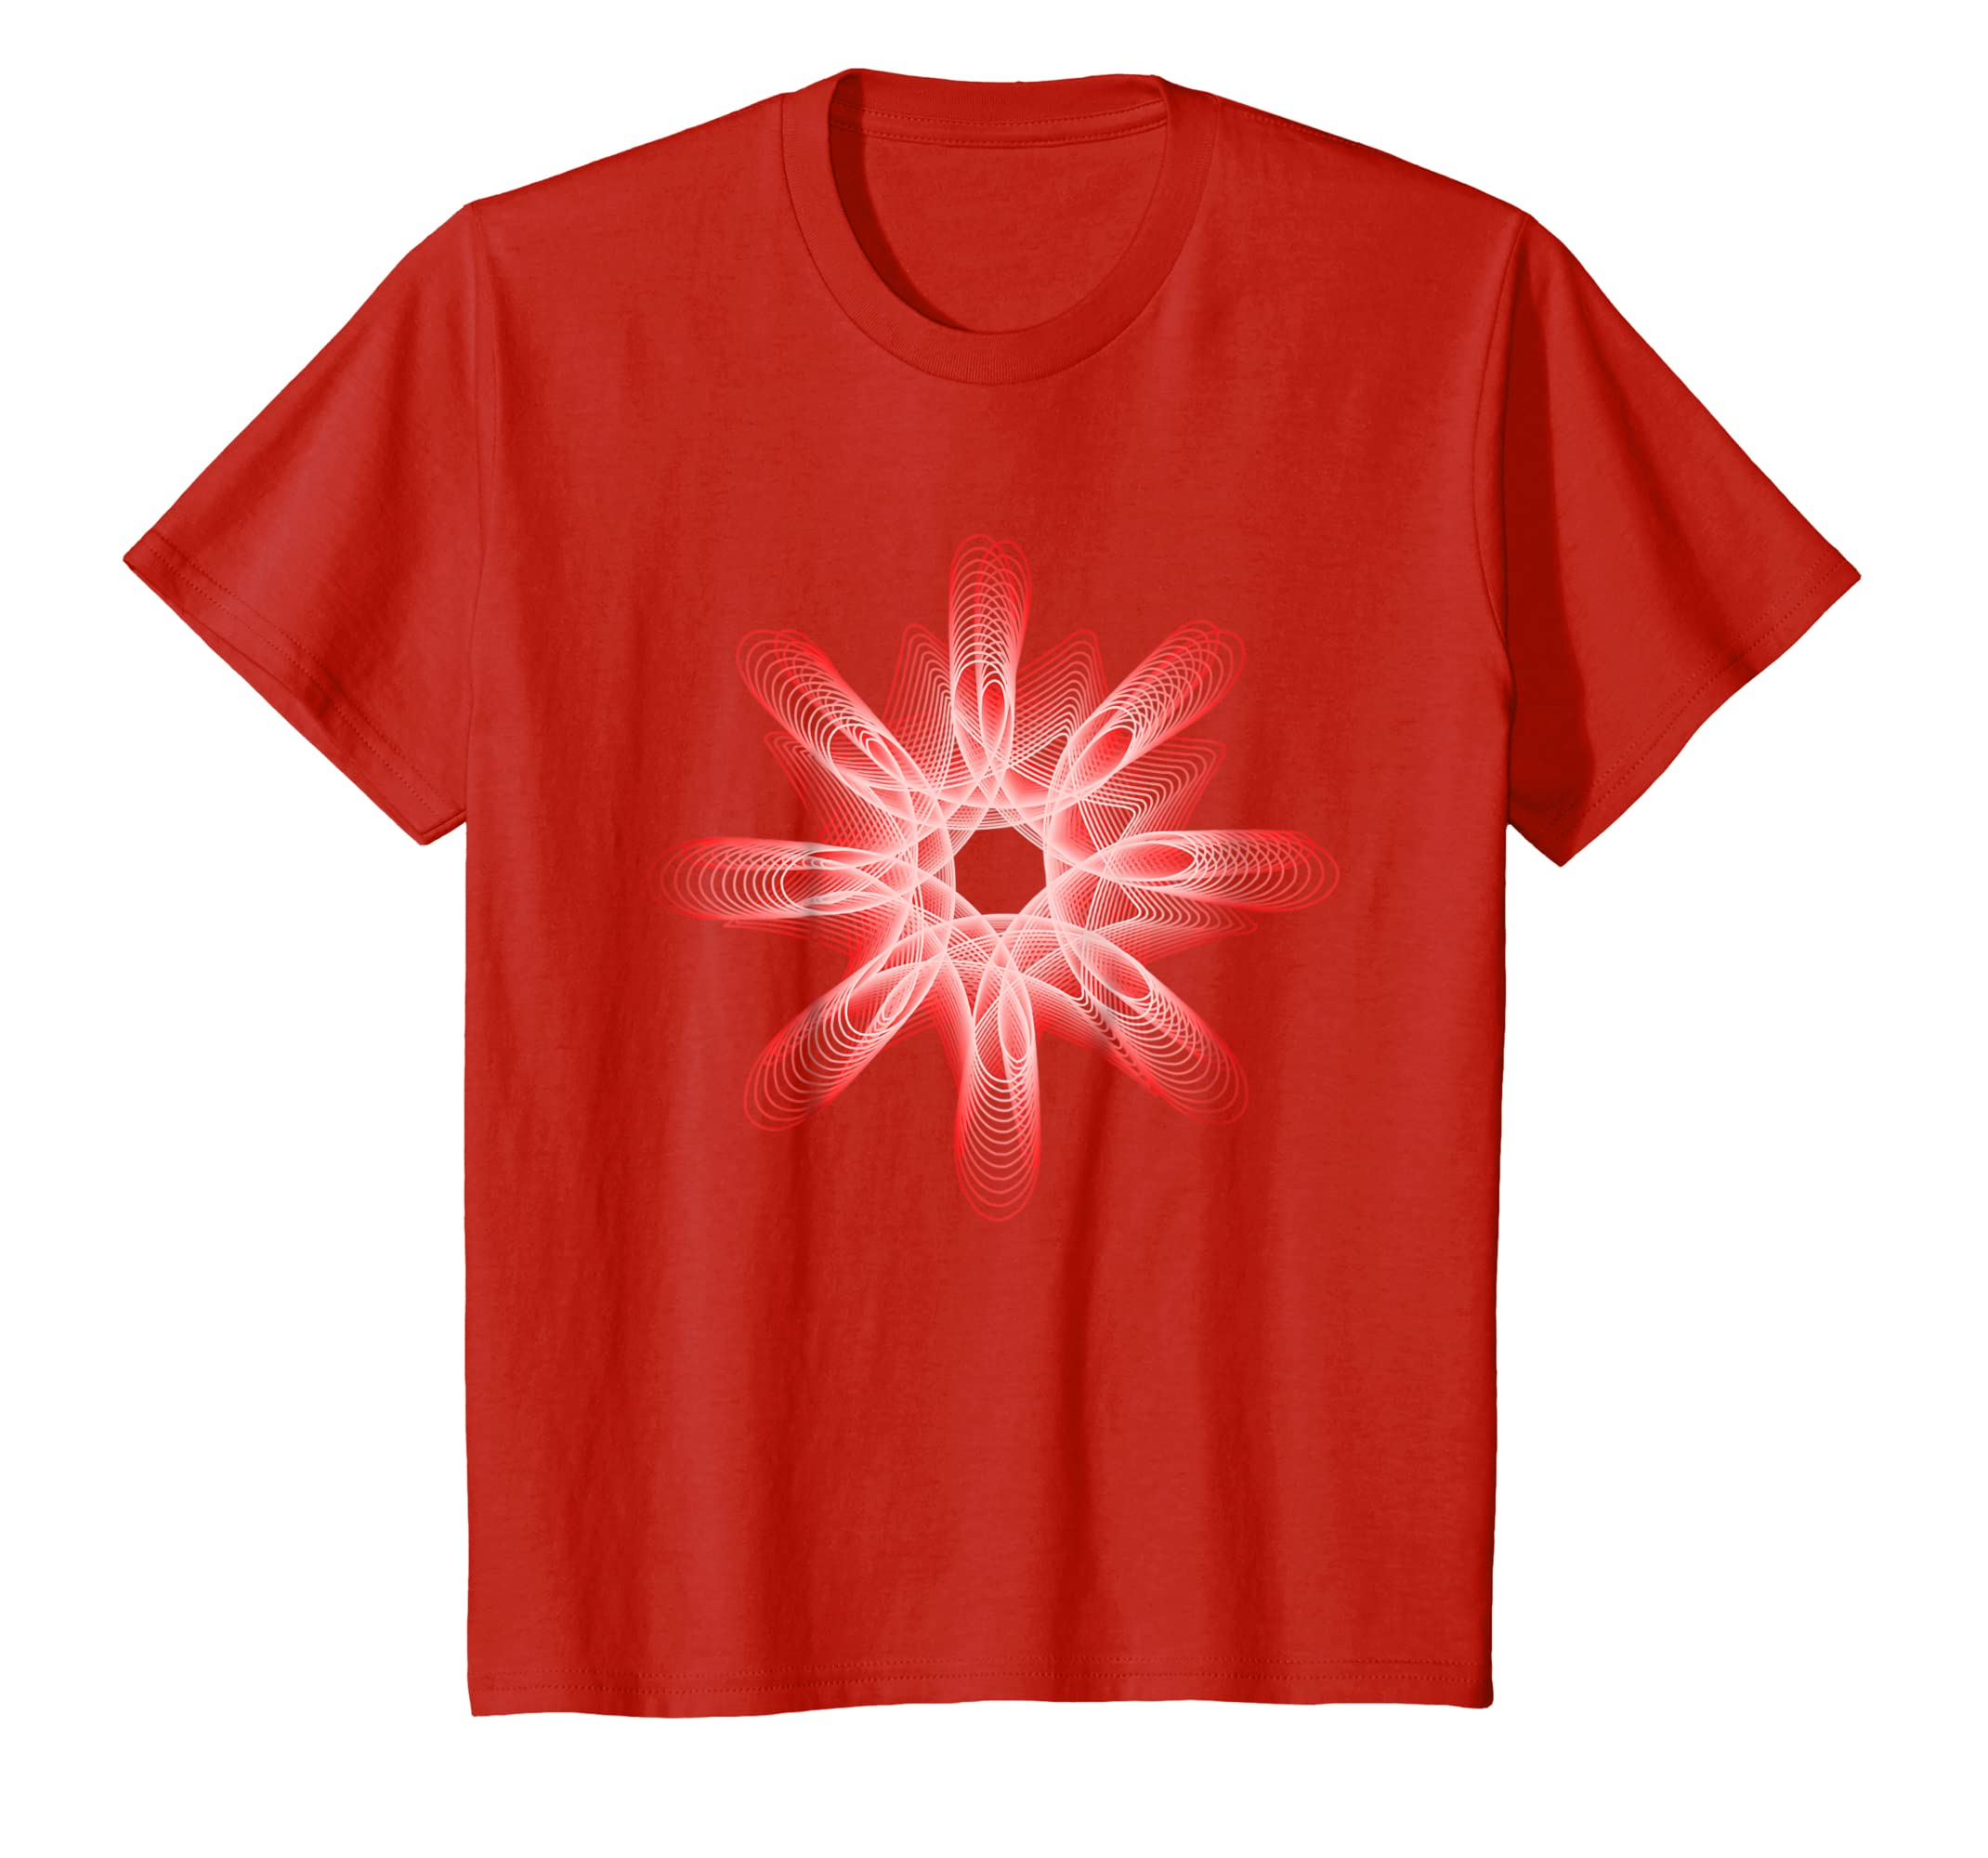 Amazon Com Shapes Mania Abstract Dreamy Nerdy Red Spiro T